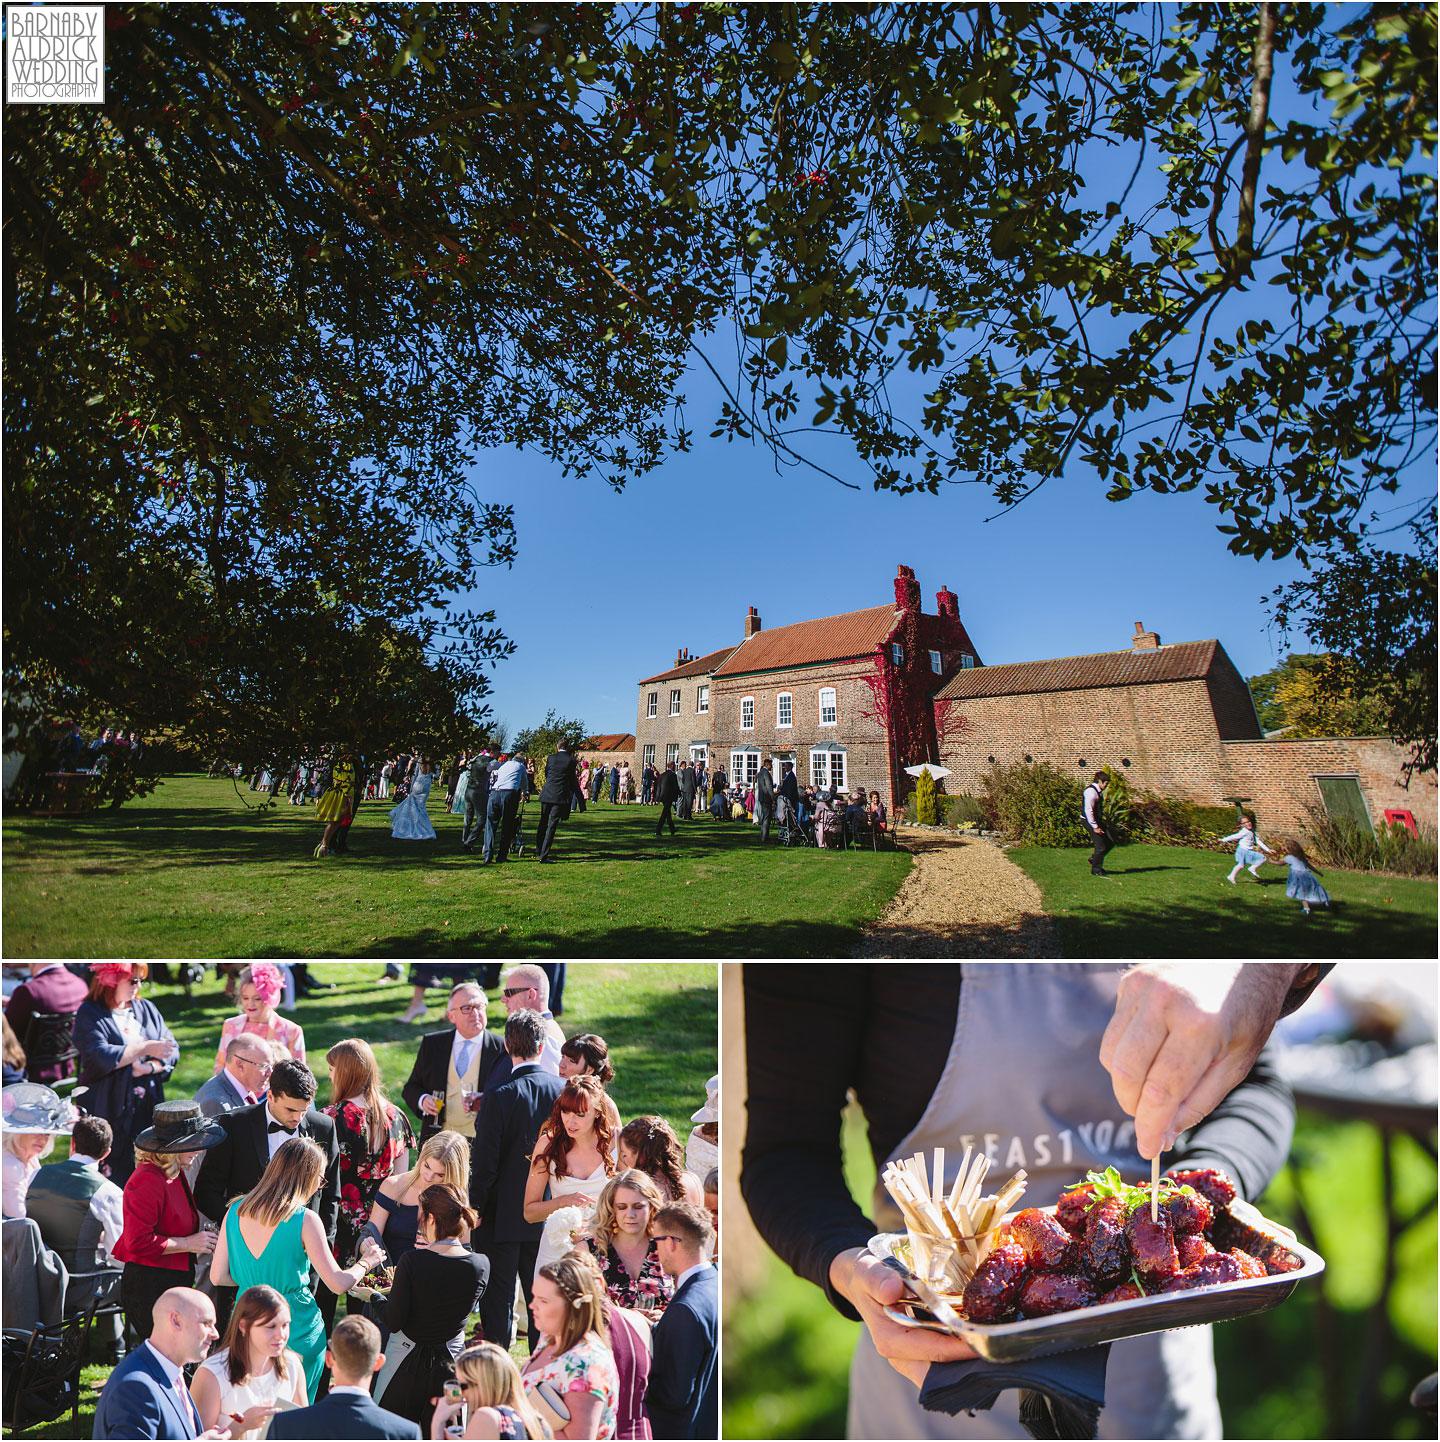 Afternoon reception at Hornington Manor, Wedding band at Hornington Manor, Hornington Manor Wedding Photography, Hornington Manor Wedding Photographer, Yorkshire Wedding, Yorkshire Wedding Photographer, York Luxury Barn Wedding Venue, Yorkshire farmhouse Wedding Barn